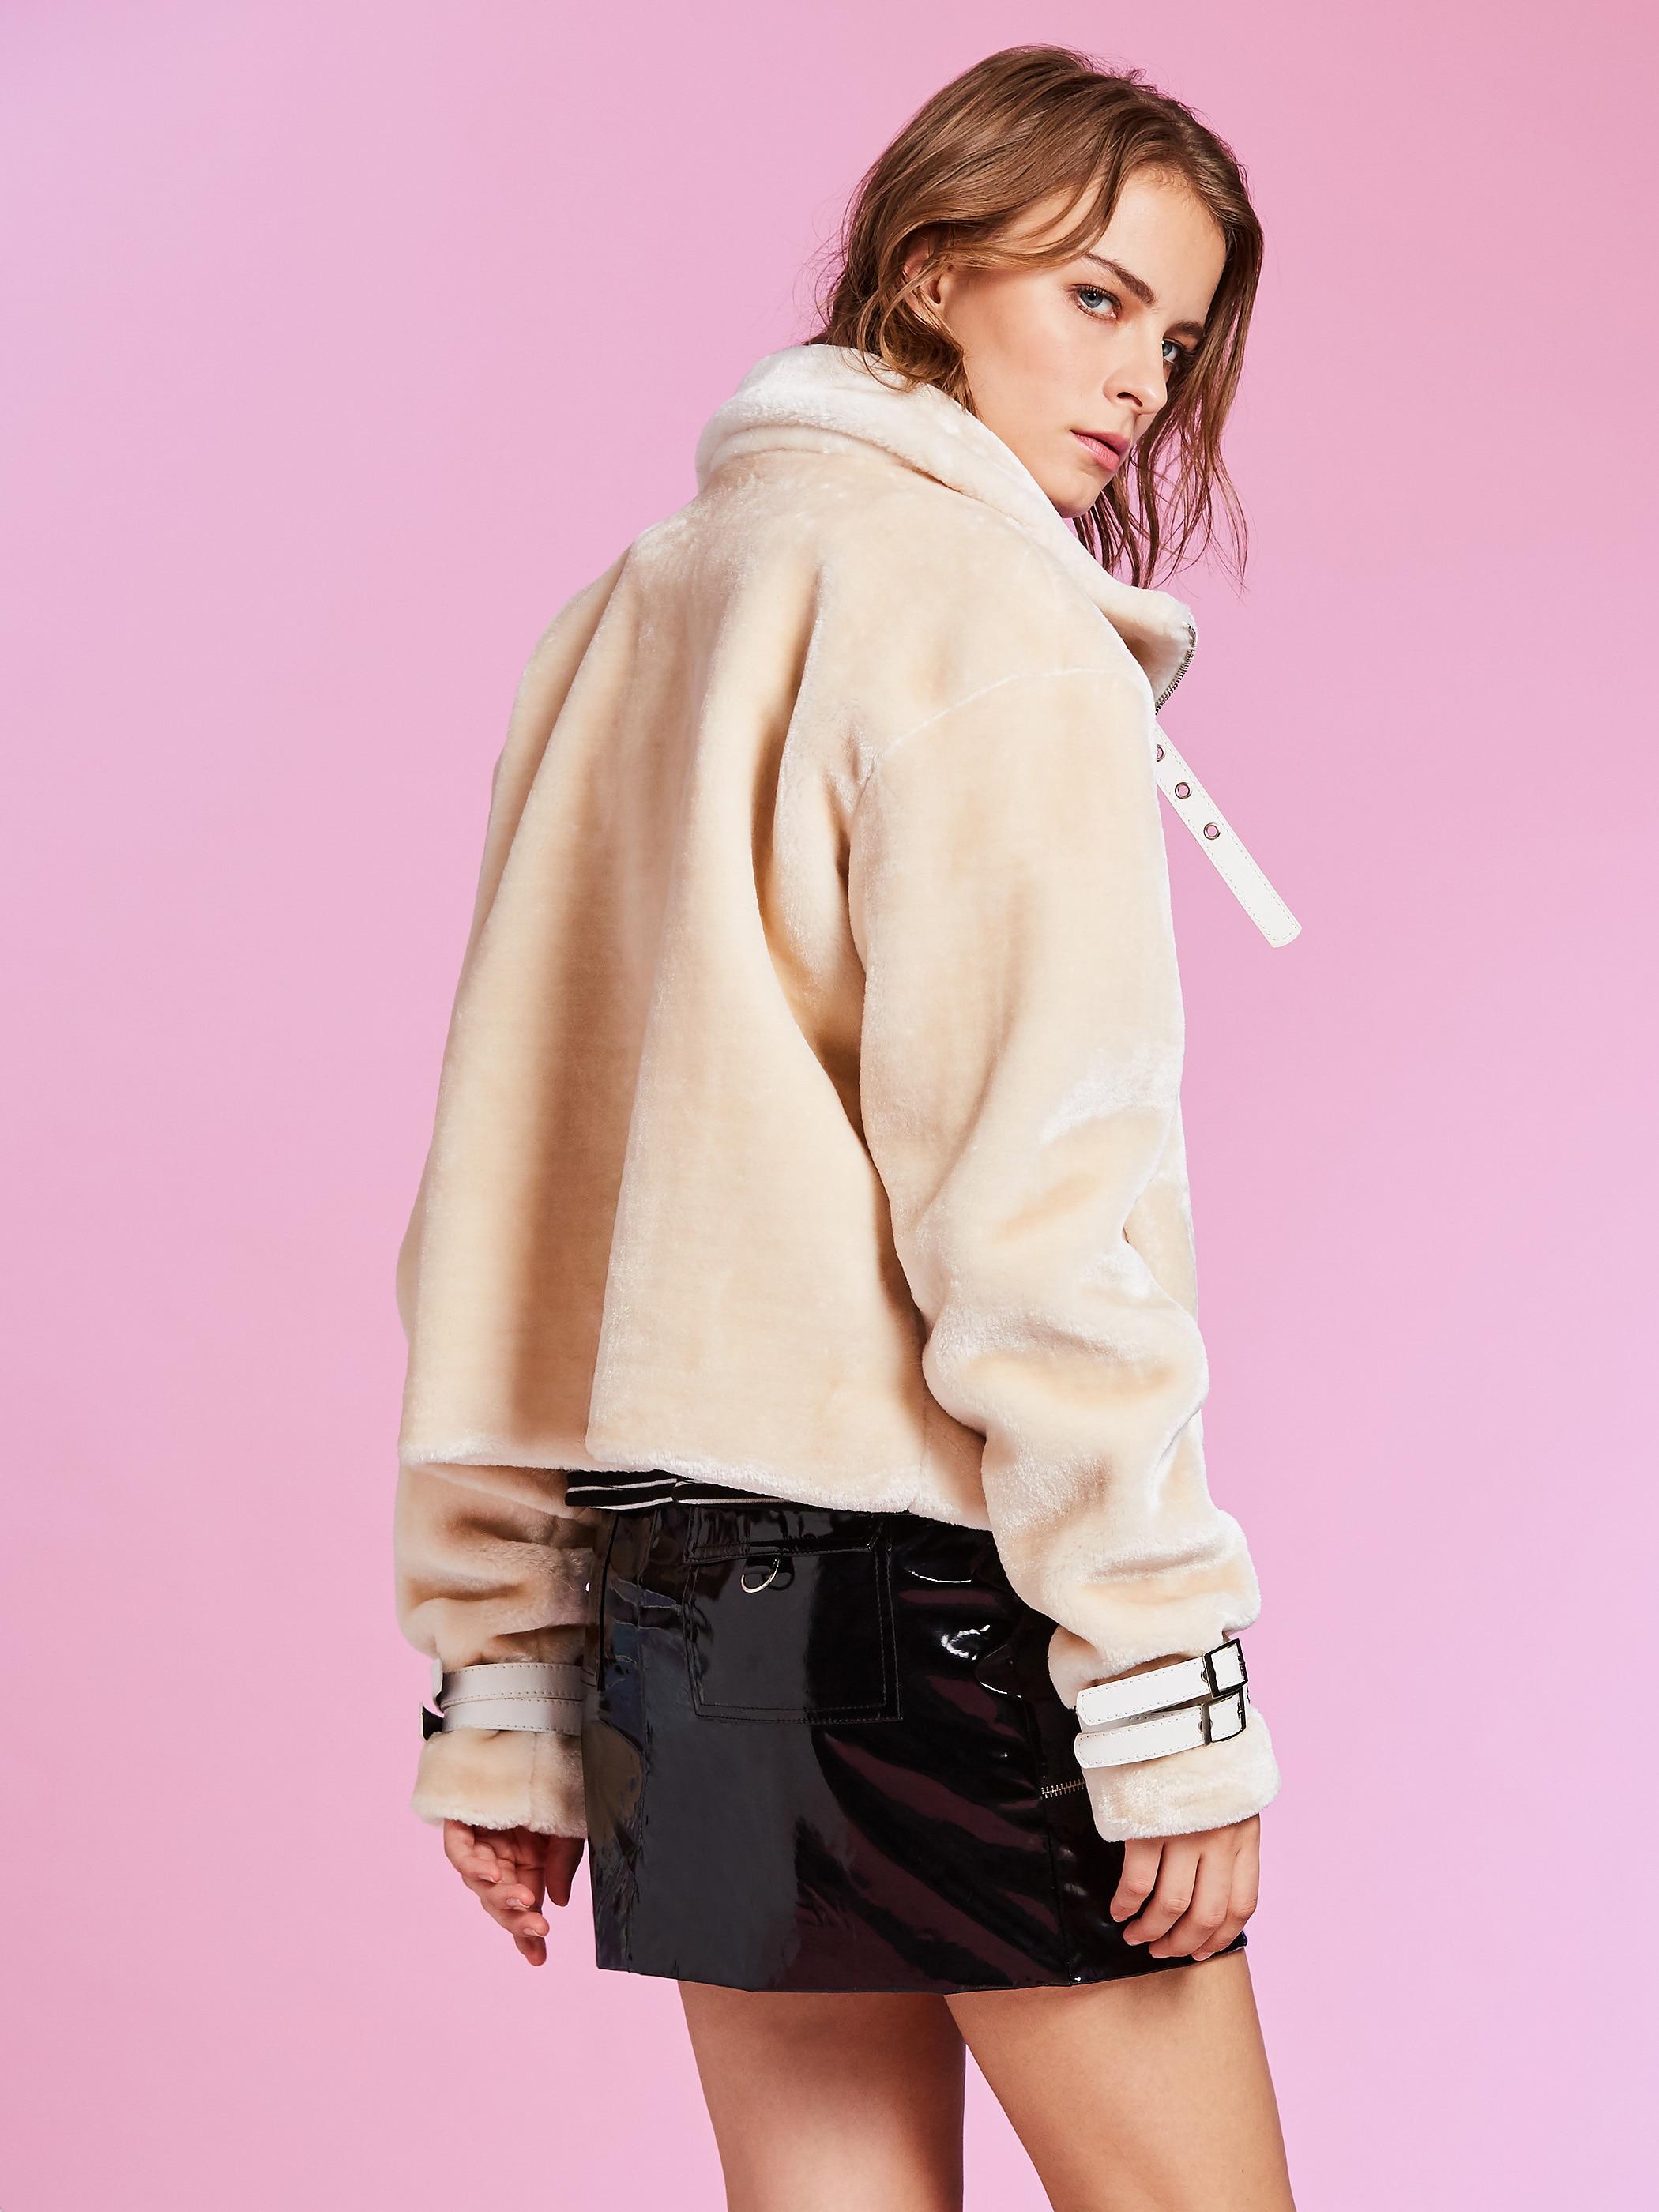 Slim Lapel Plain Zipper Women Jacket wool blend winter warm coat beige high street plain zipper flee